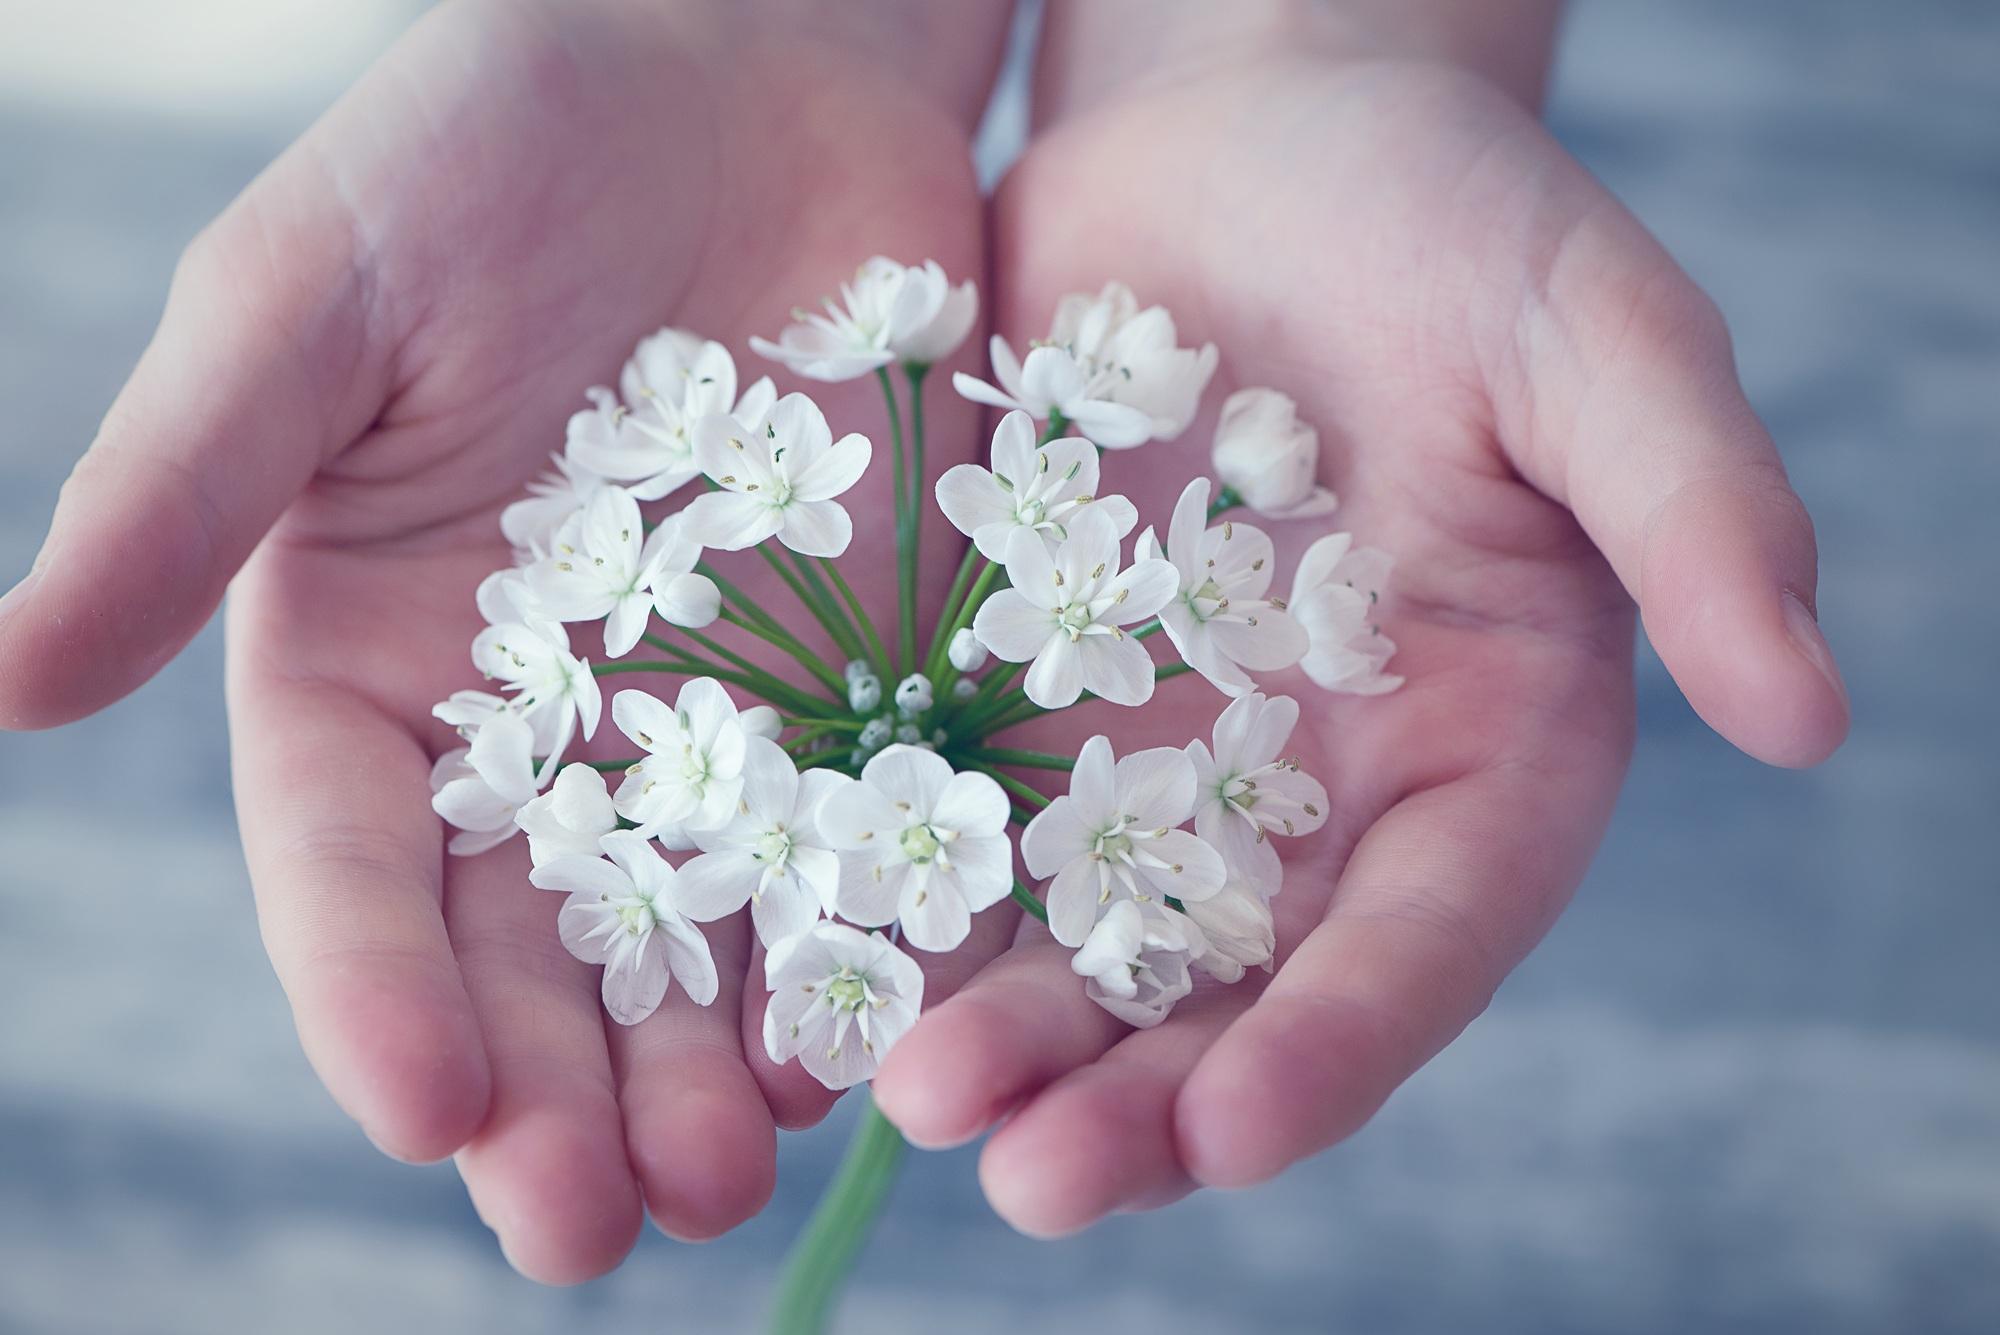 flower-flowers-small-flowers-white-161561.jpeg (2000×1335)